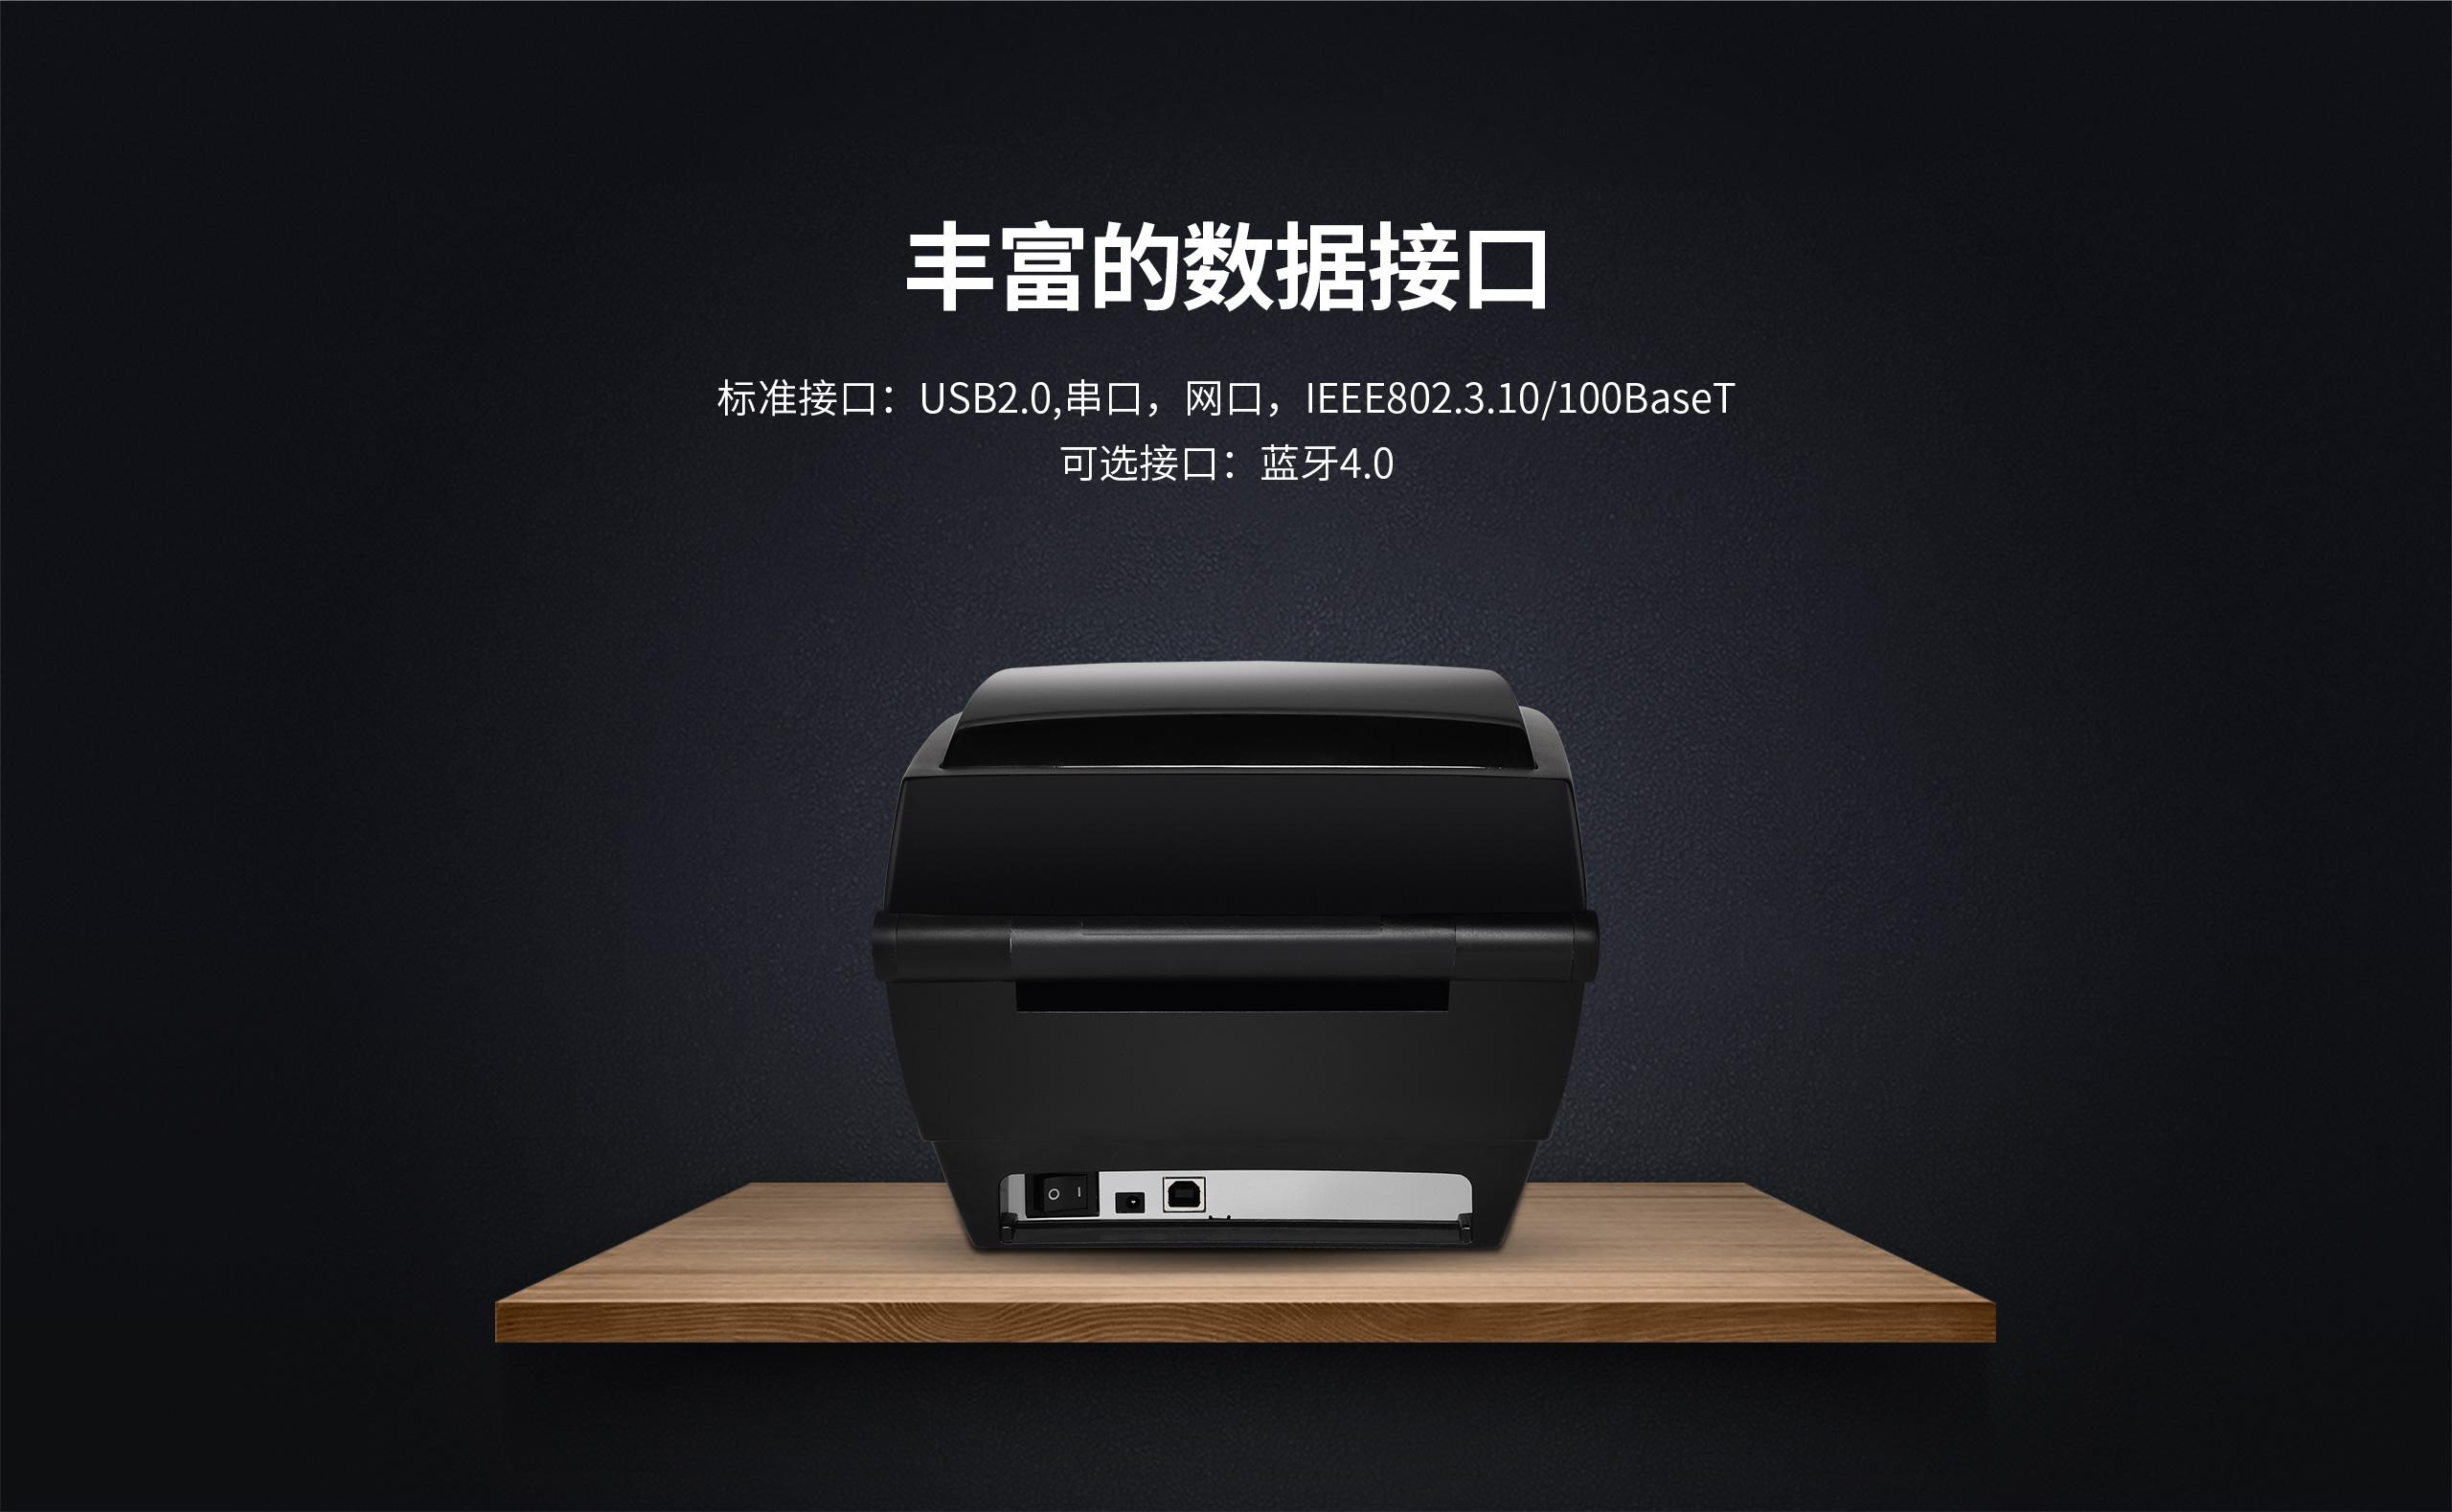 HT100/HT130专业级标签打印机  第7张